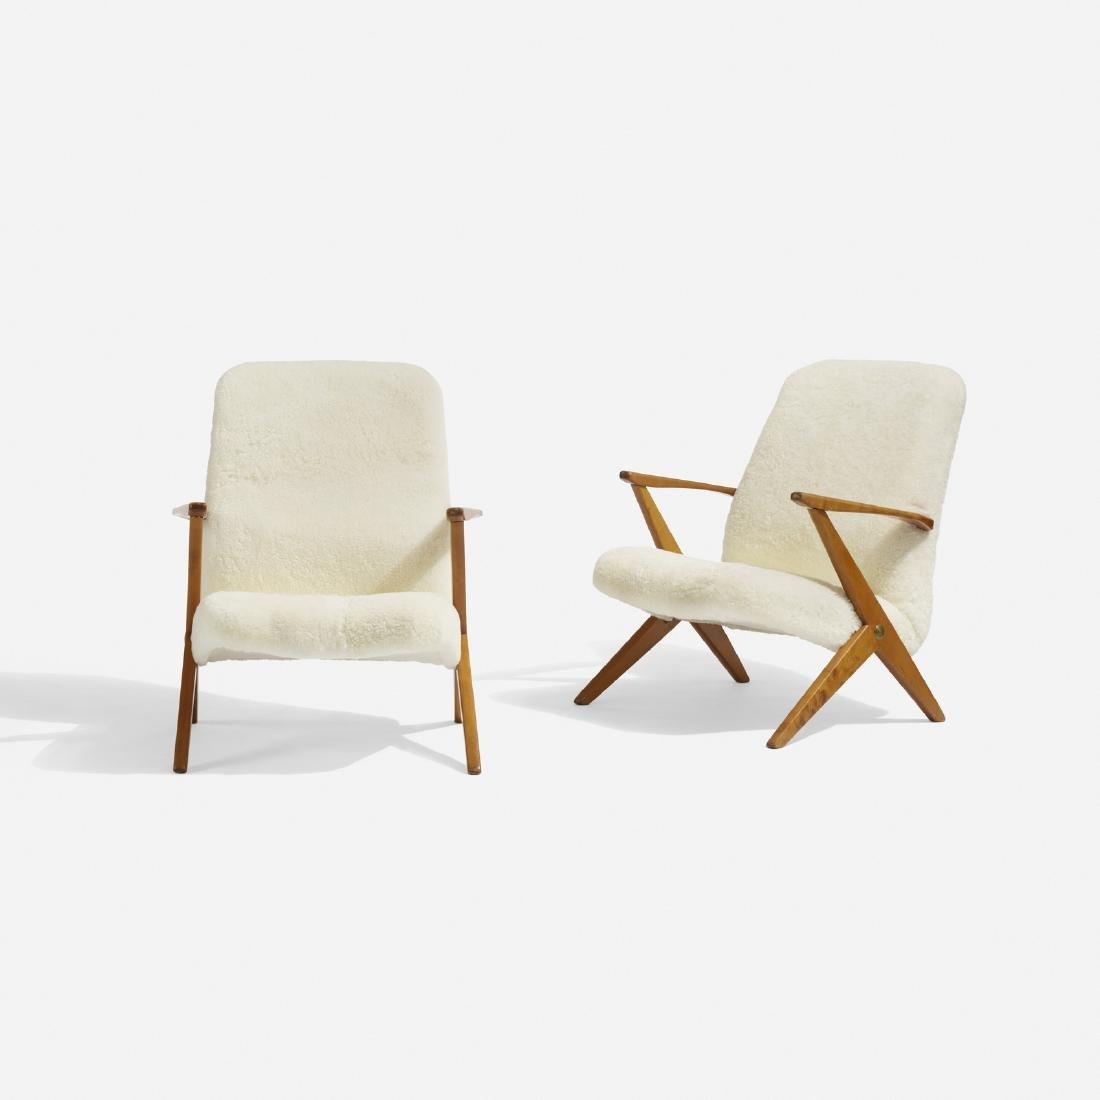 Bengt Ruda, lounge chairs, pair